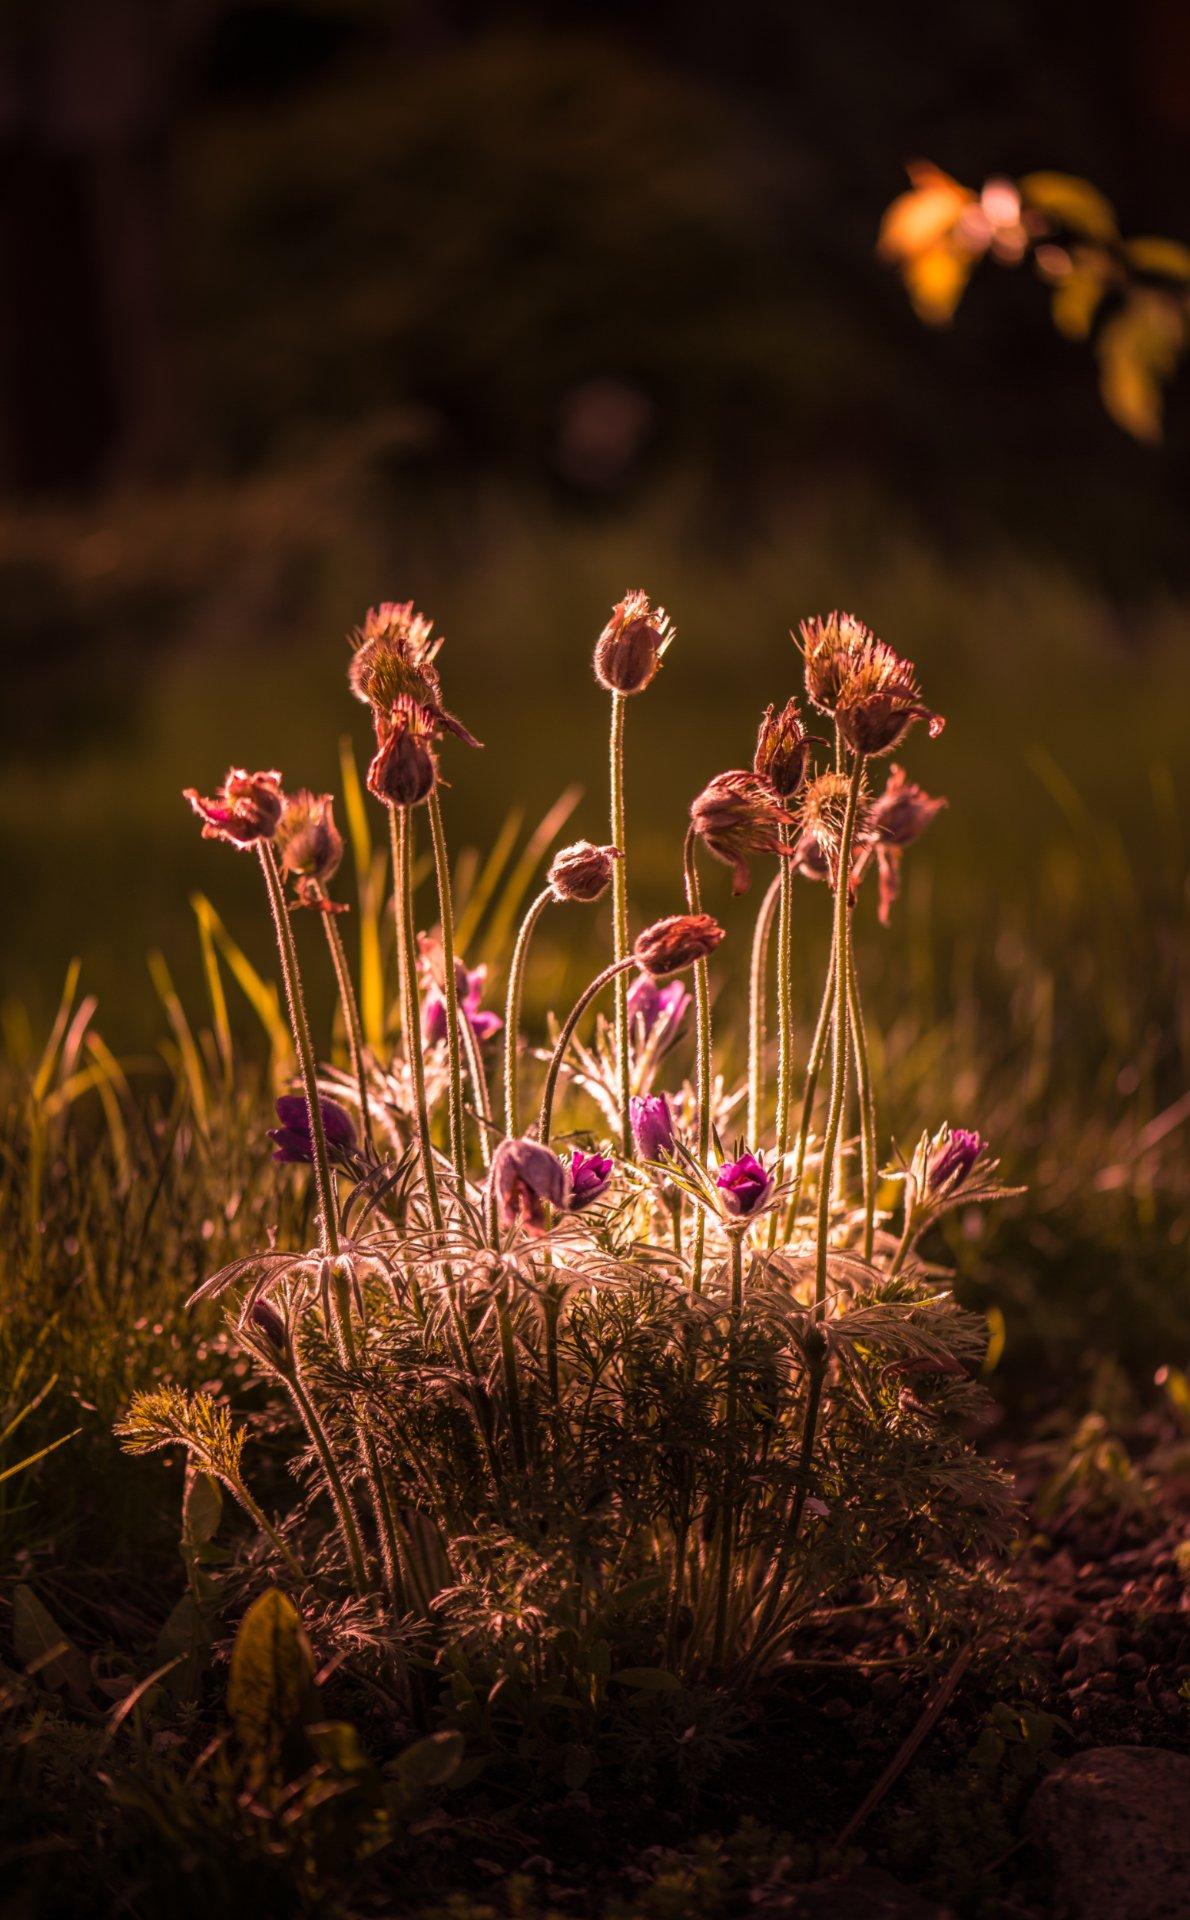 природа, макро, весна, цветы, прострел, сон-трава, Неля Рачкова